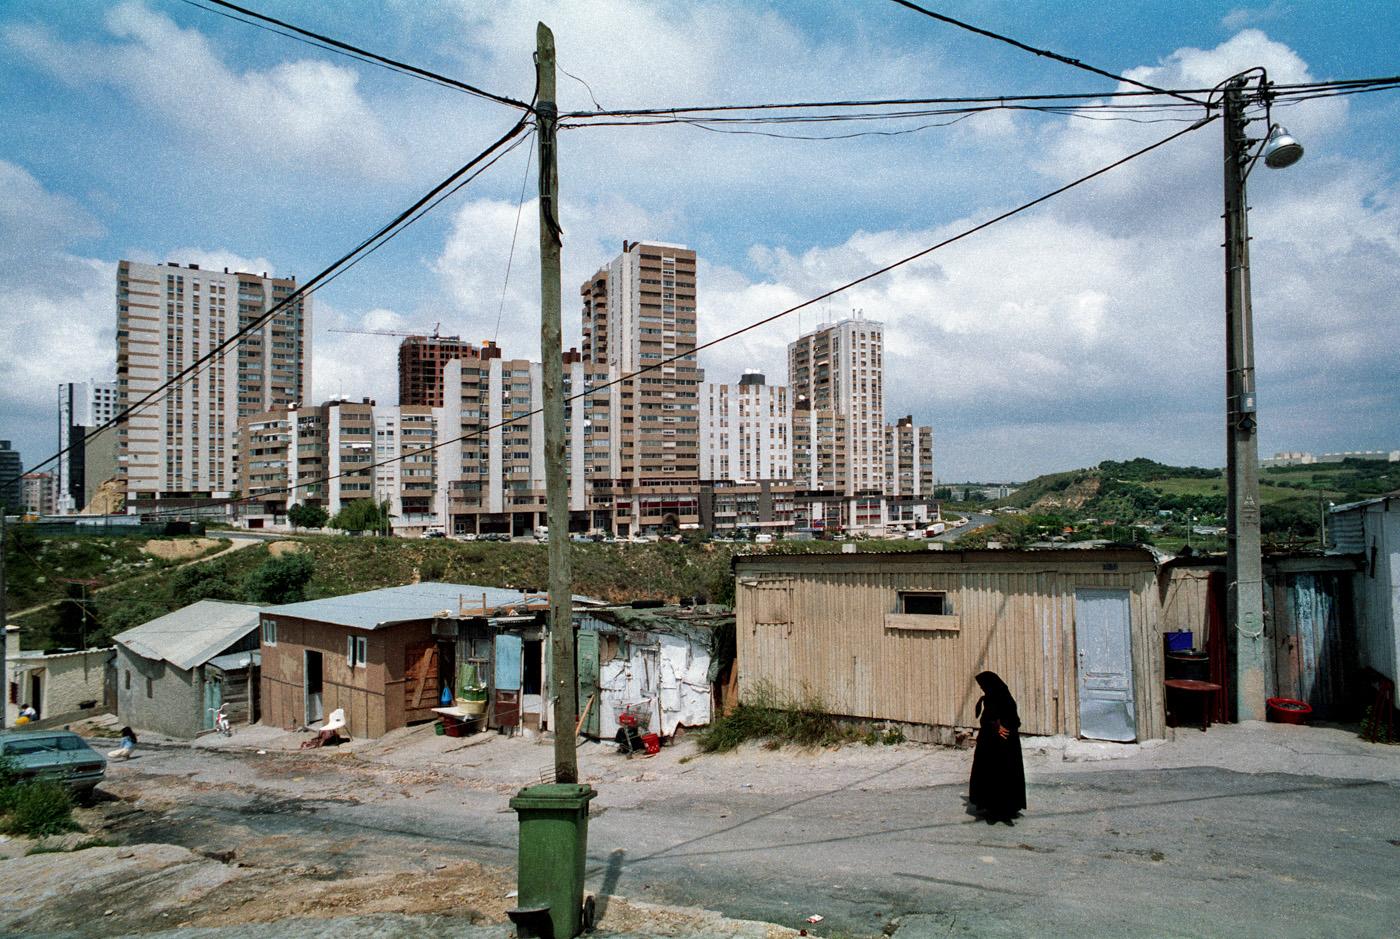 Lisabon, Kapverden-Siedlung, Portugal